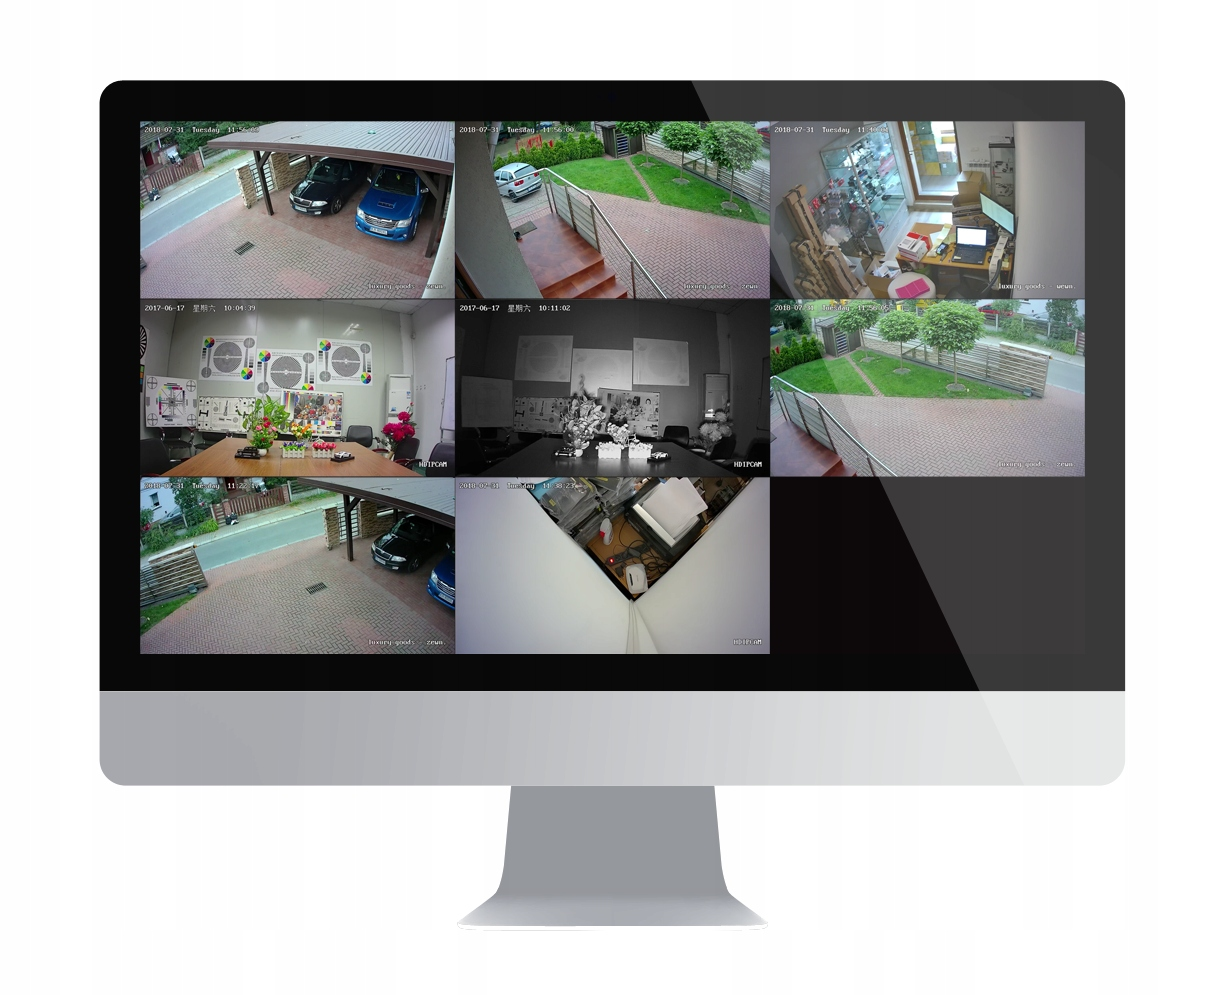 2x FULL HD SONY MONITORING H265+ NVR POE WDR IR Wyjścia wideo VGA HDMI